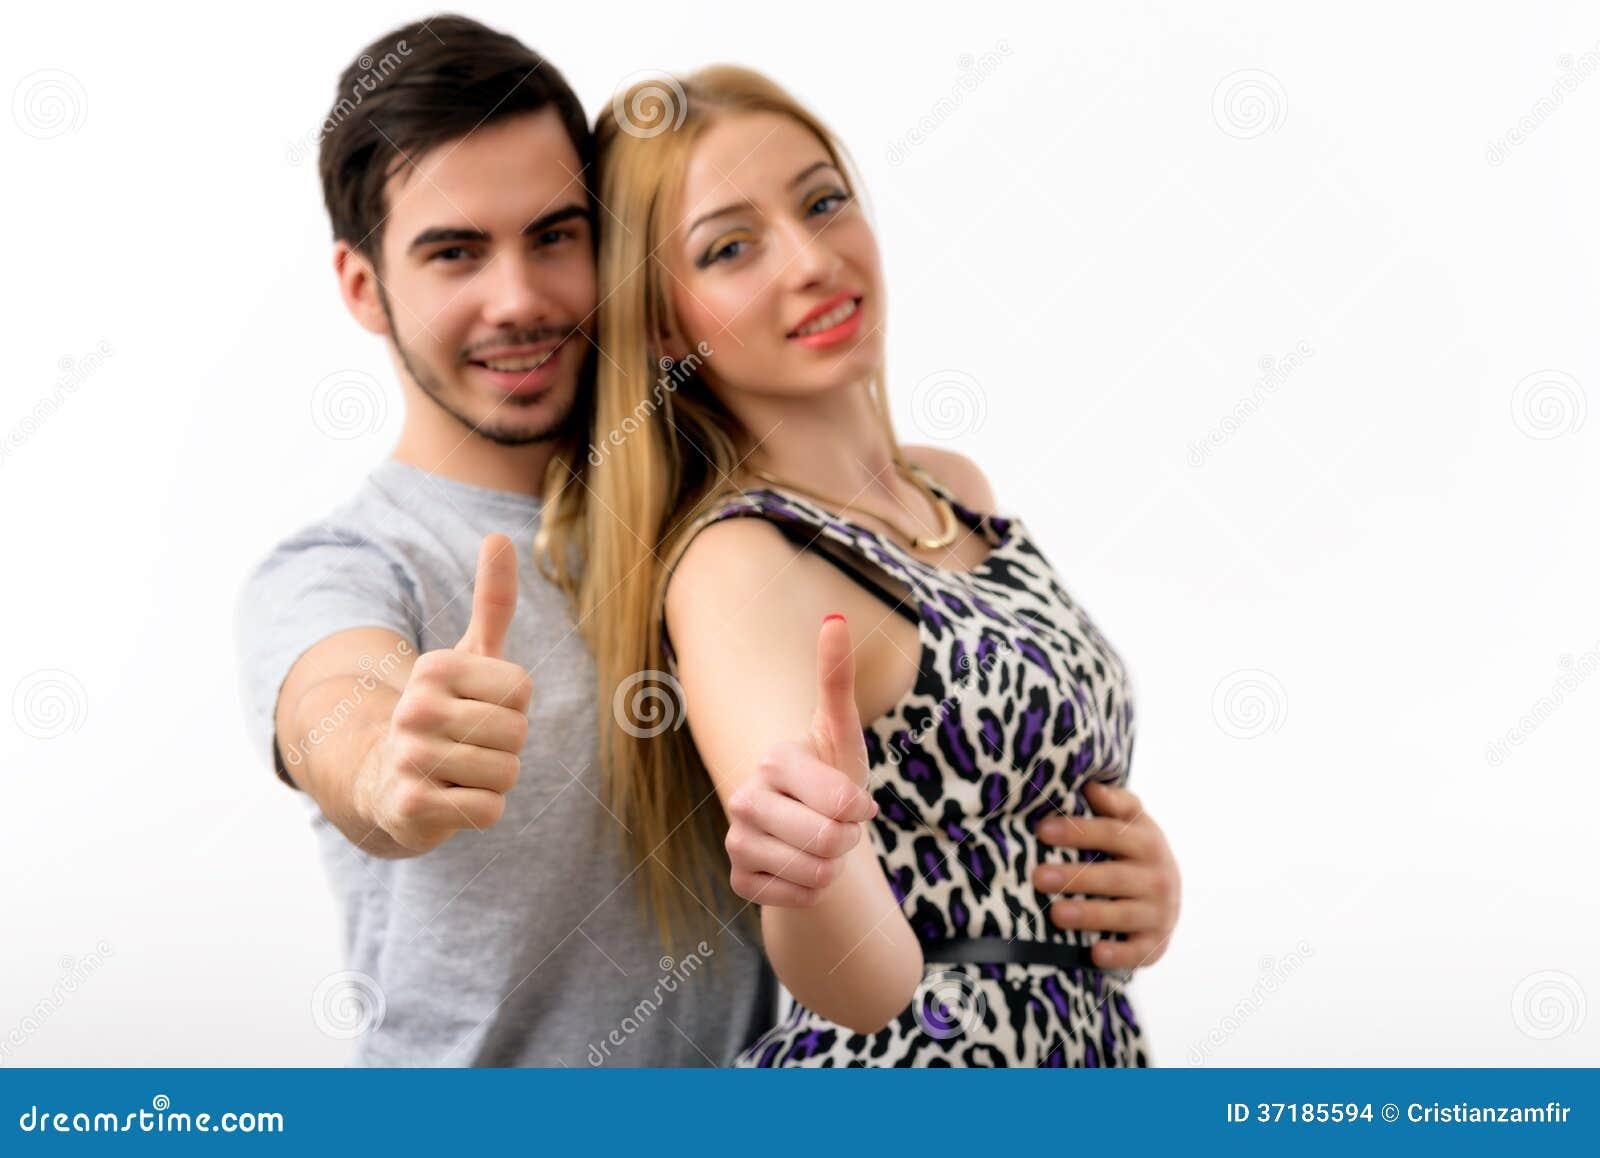 Men thumbs for ladies